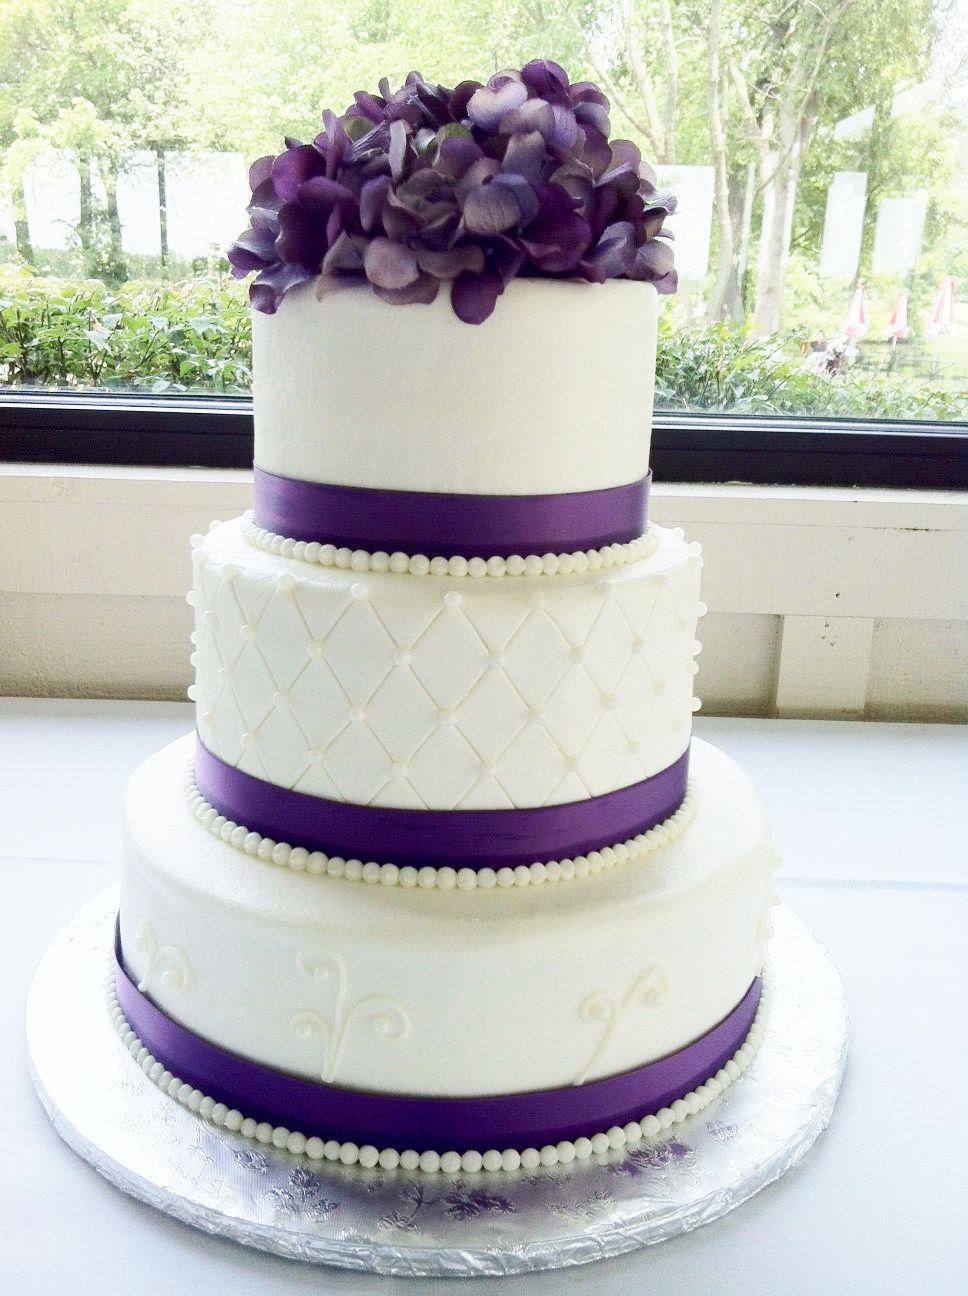 Buttercream iced wedding cake | Cake | Pinterest | Buttercream icing ...